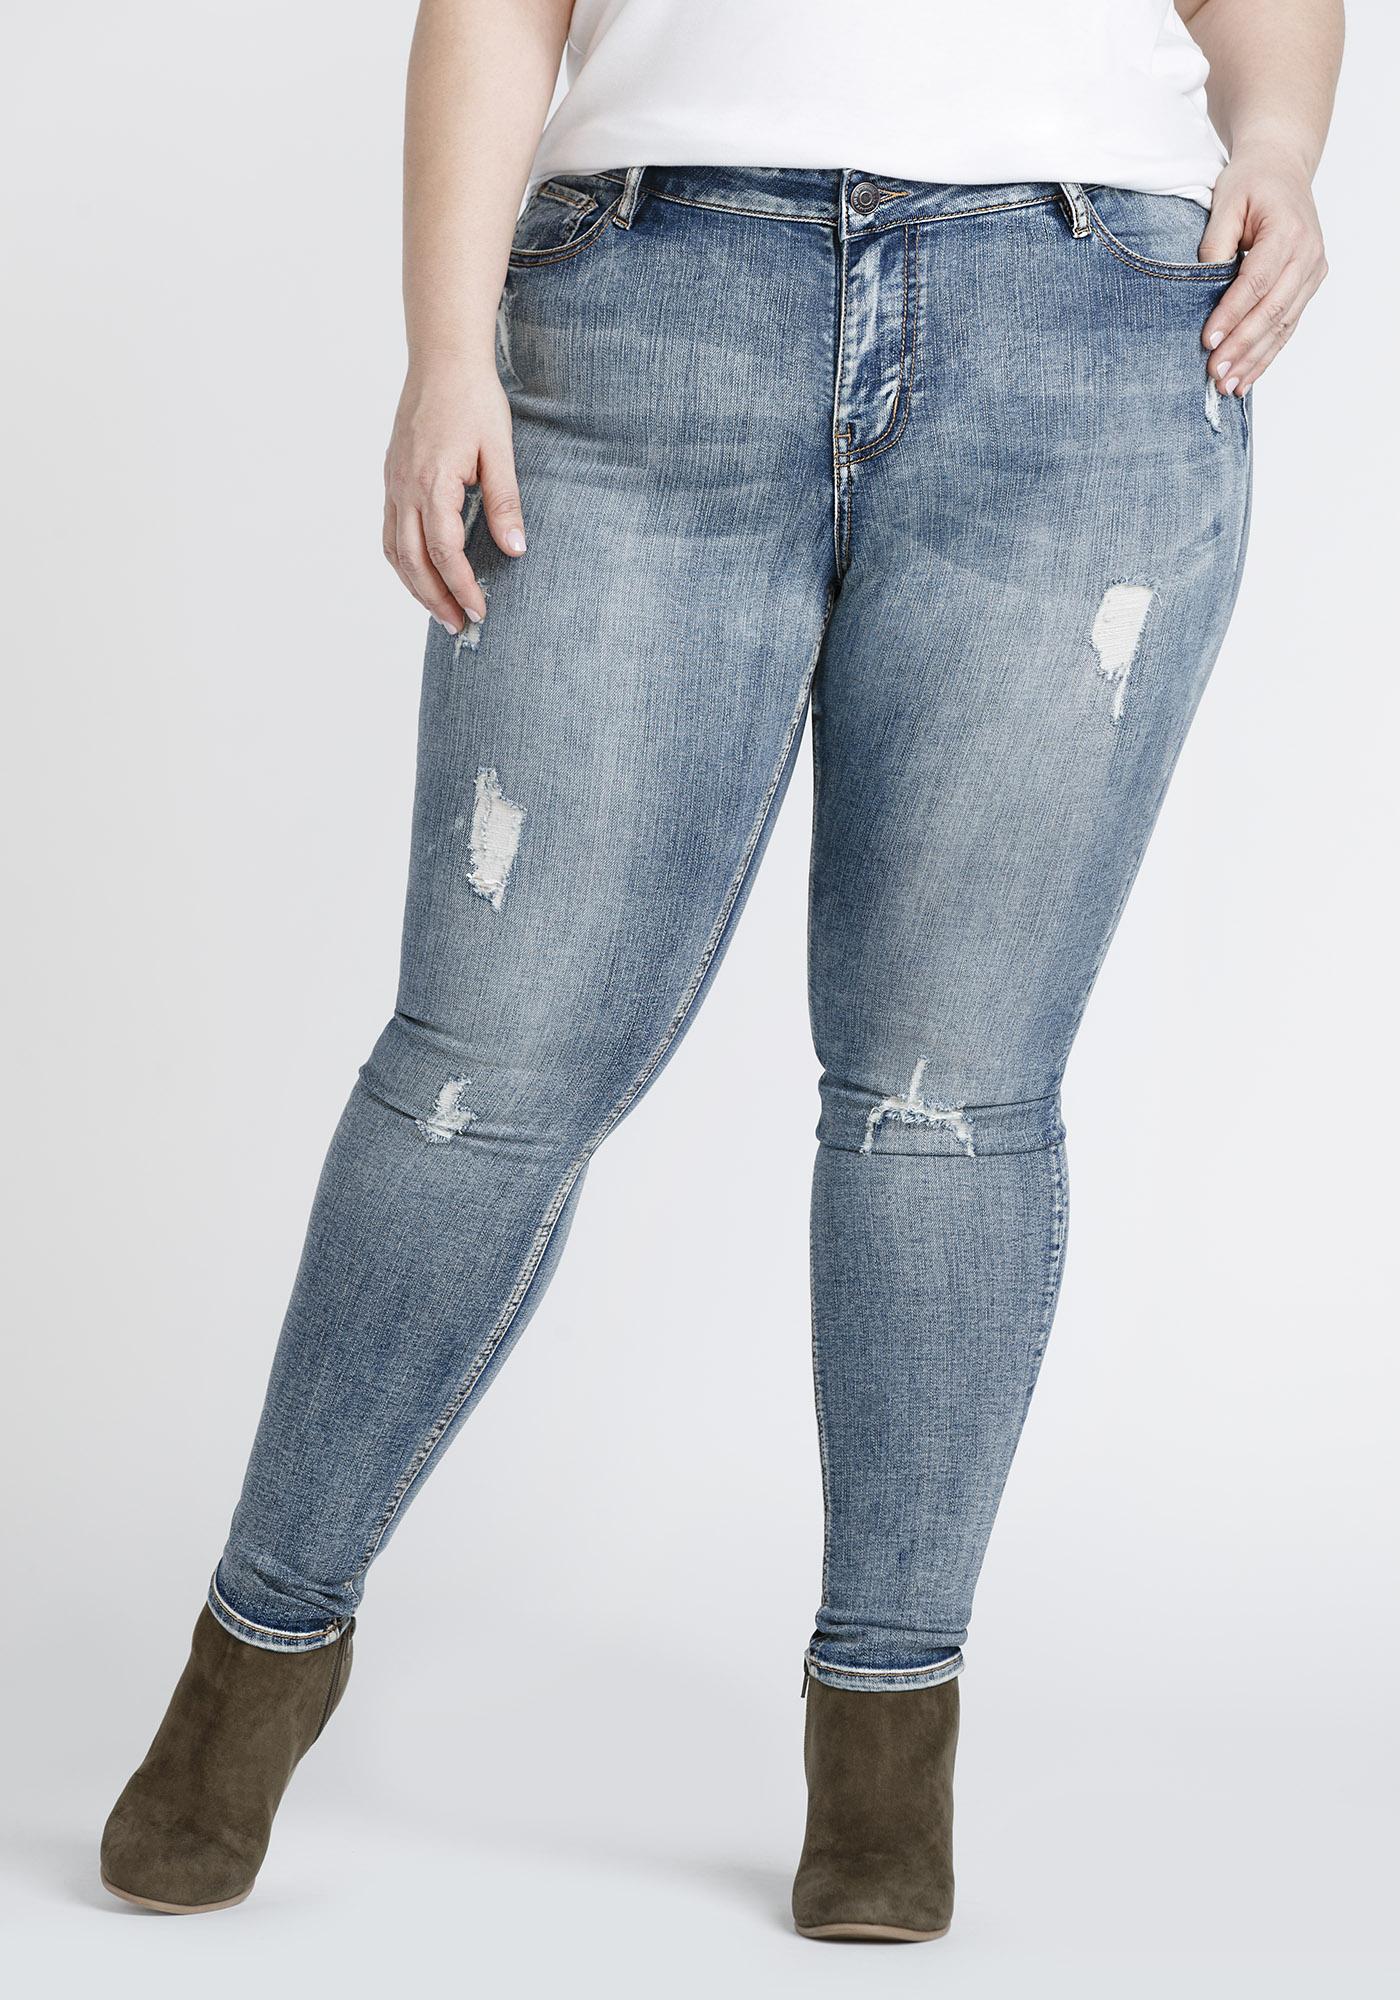 7bf0438e3f9 Women s Plus Size Vintage Distressed Skinny Jeans